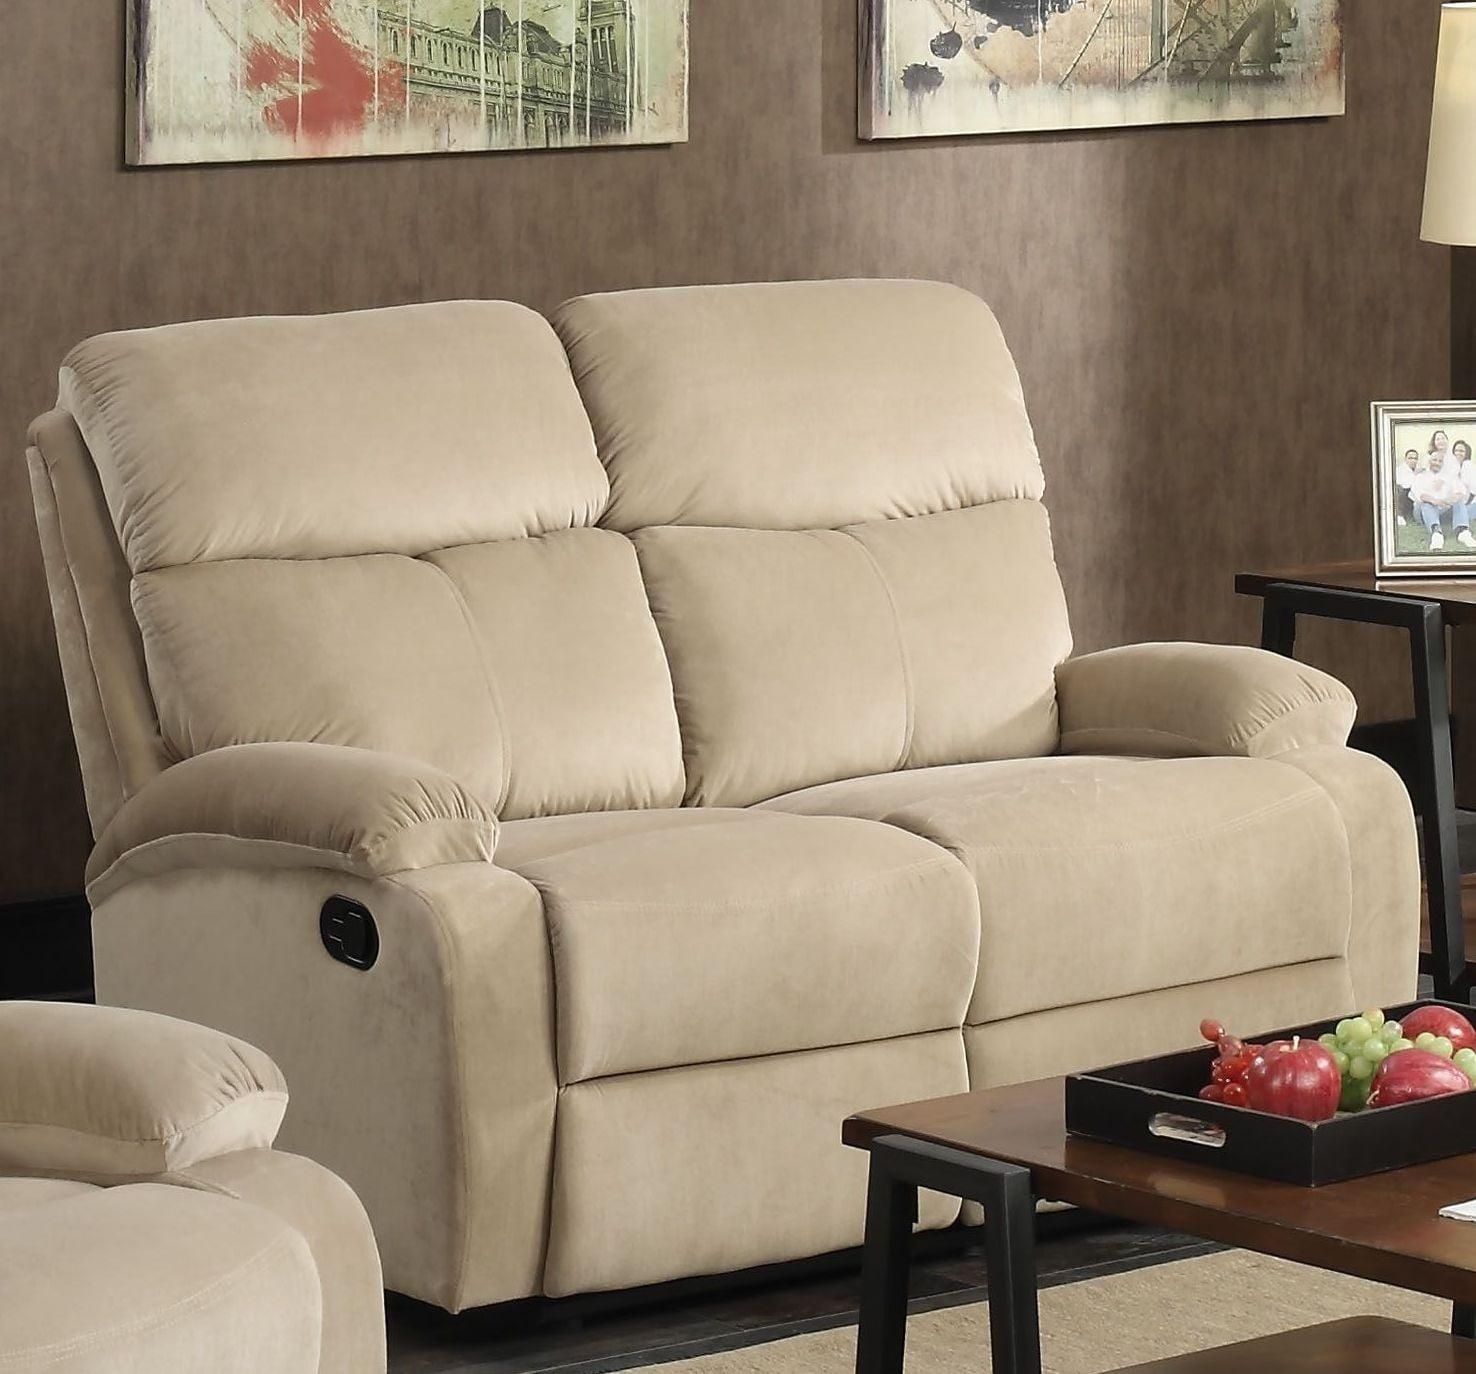 Mayborn Sand Velvet Reclining Living Room Set from Acme | Coleman ...